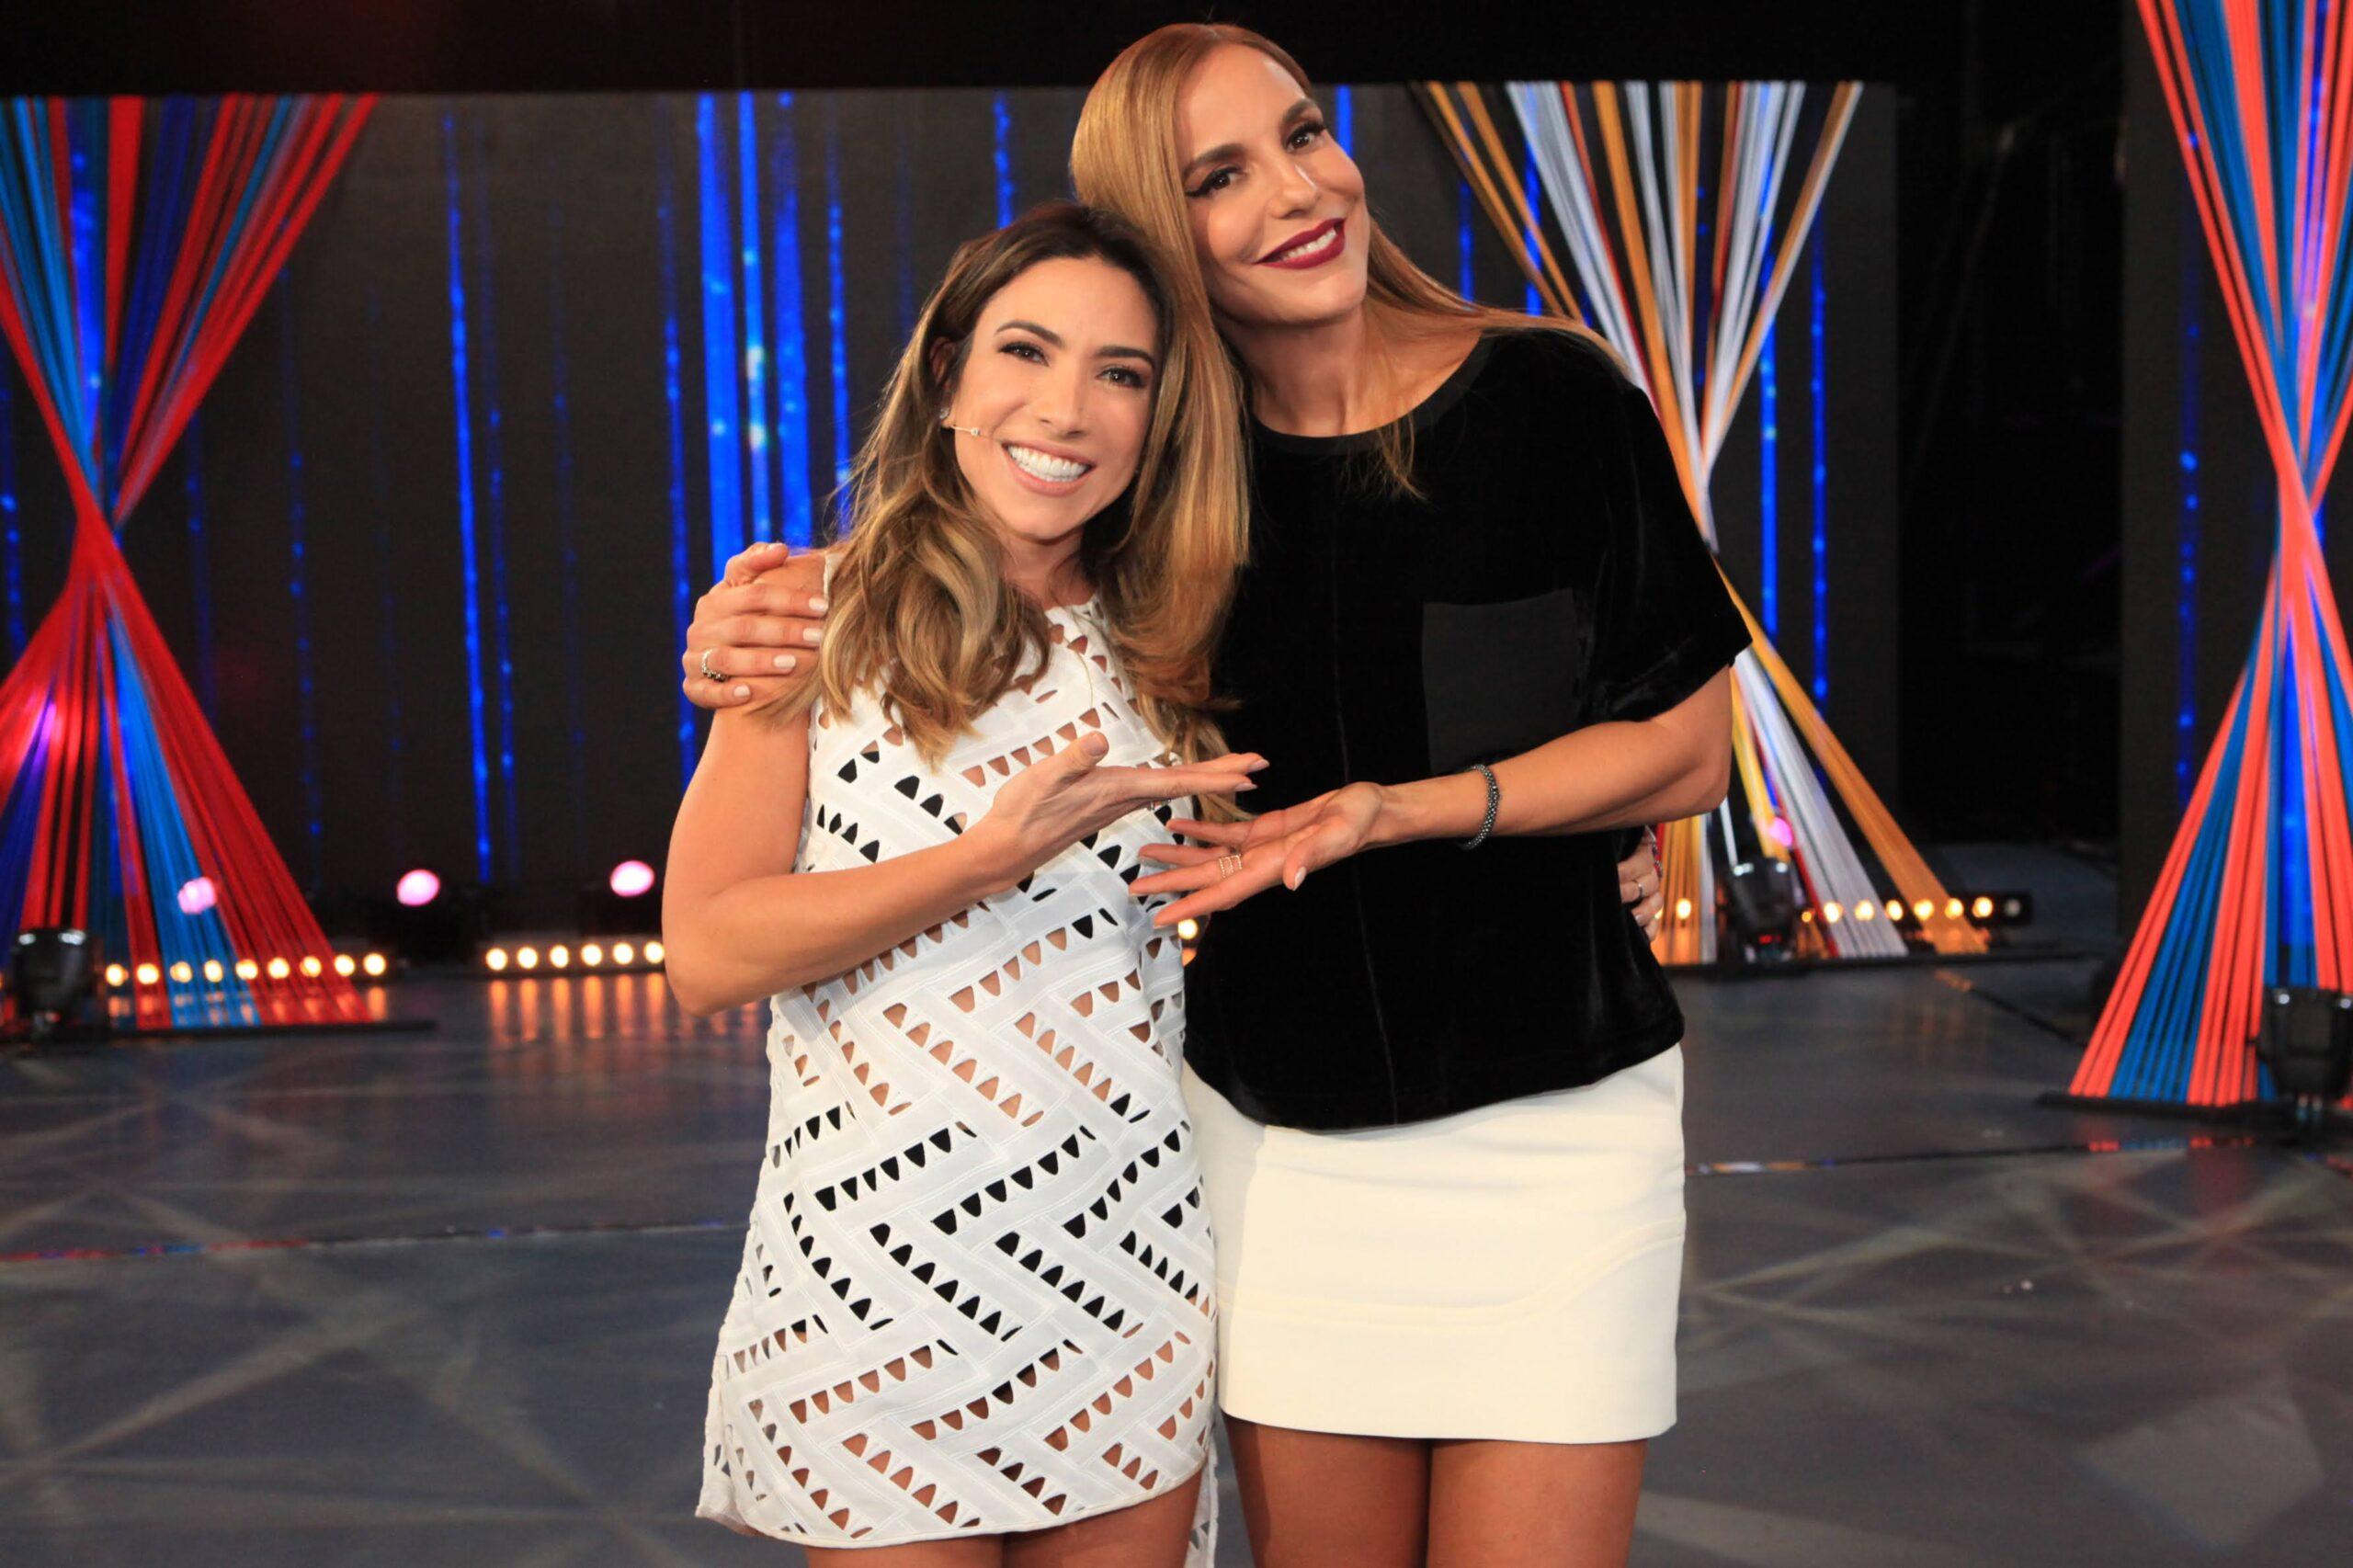 Patricia Abravanel recebe Ivete Sangalo no Máquina da Fama deste sábado (17)